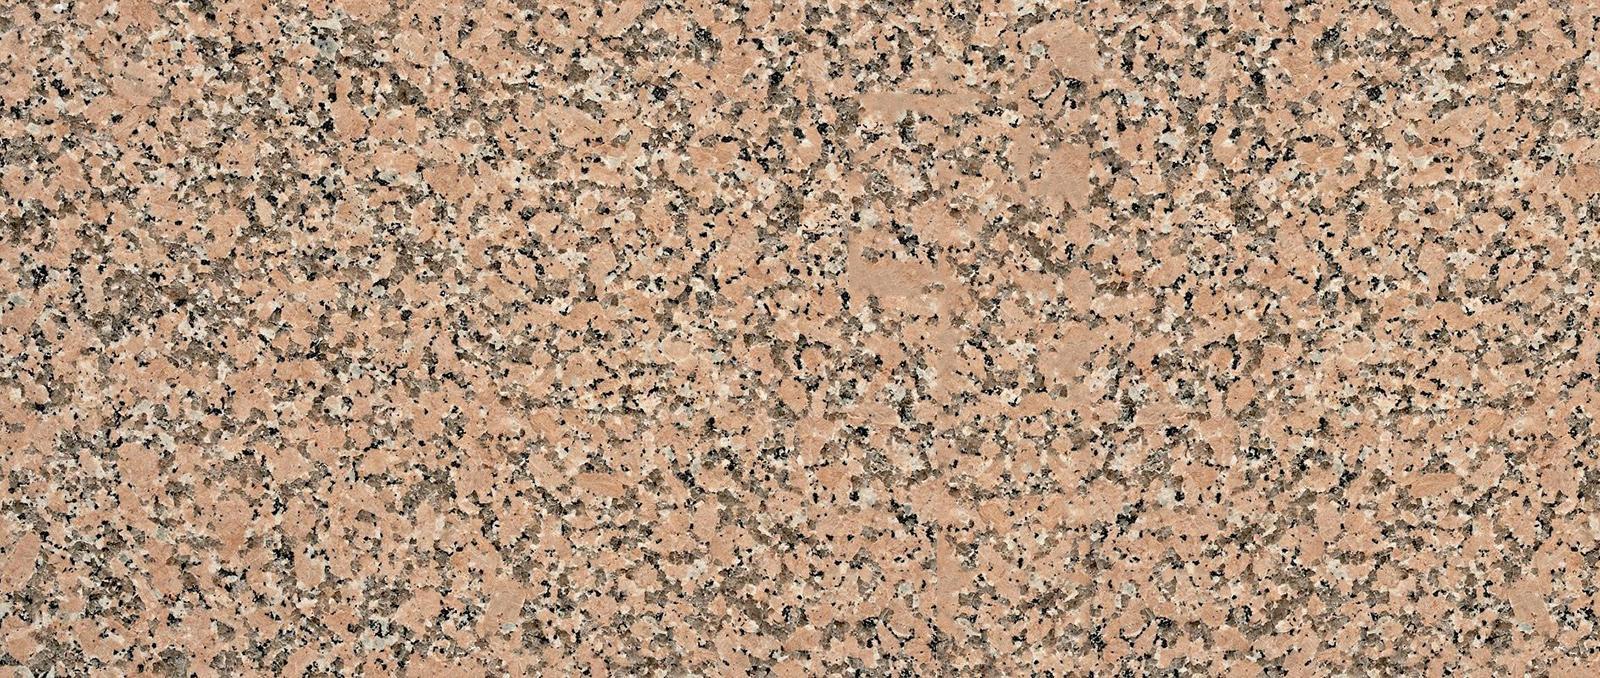 vreaupiatra-granit-rossa-porino-banner